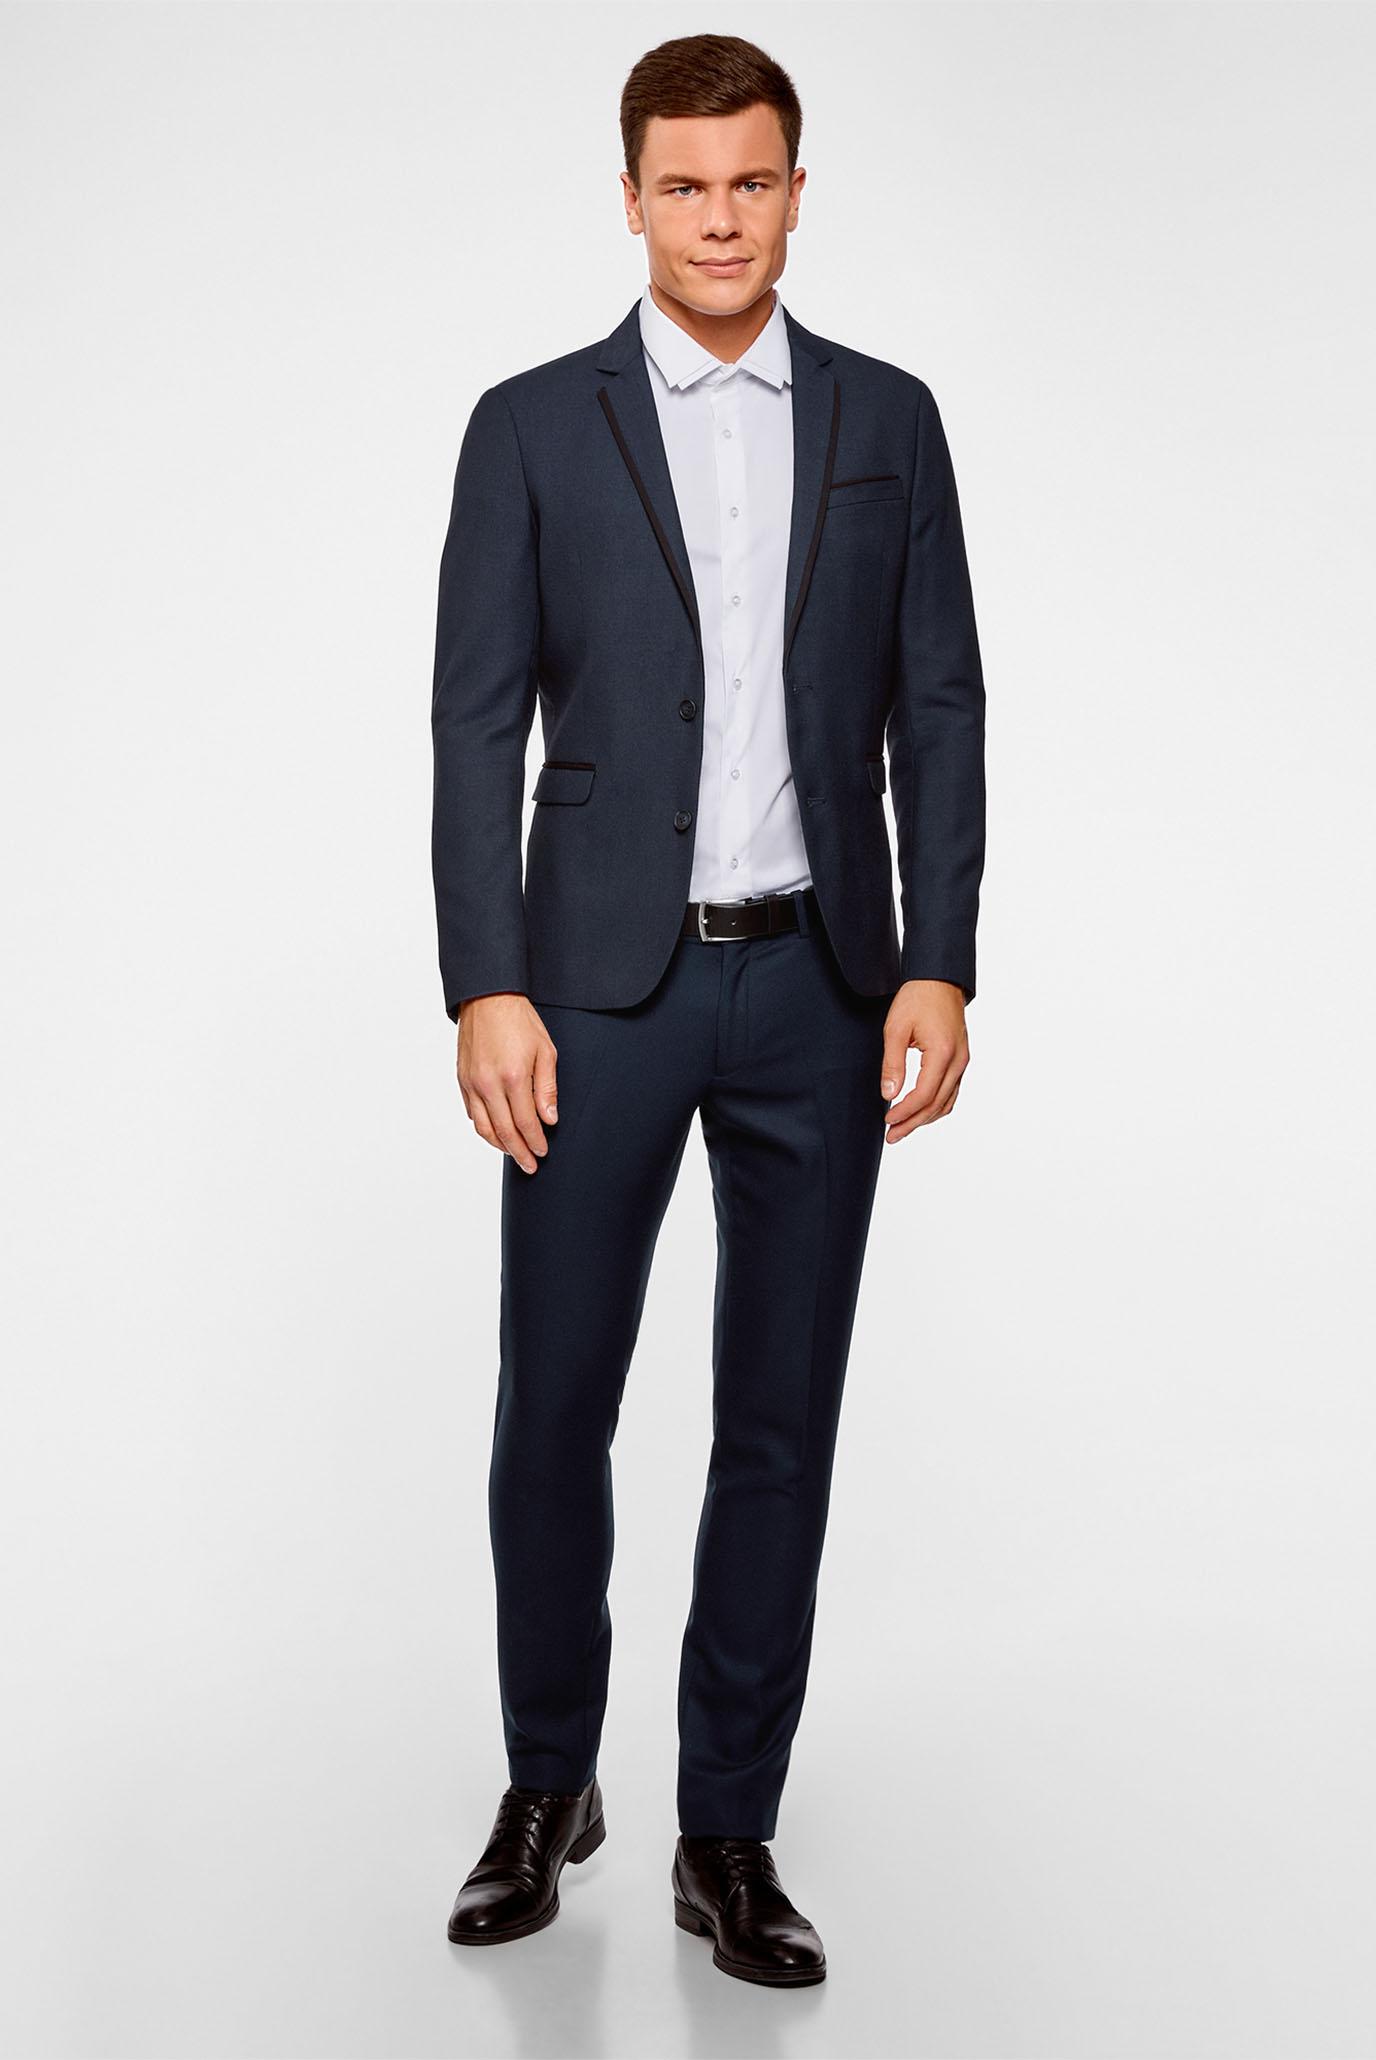 Купить Мужской синий пиджак Oodji Oodji 2L420202M/47087N/7929O – Киев, Украина. Цены в интернет магазине MD Fashion